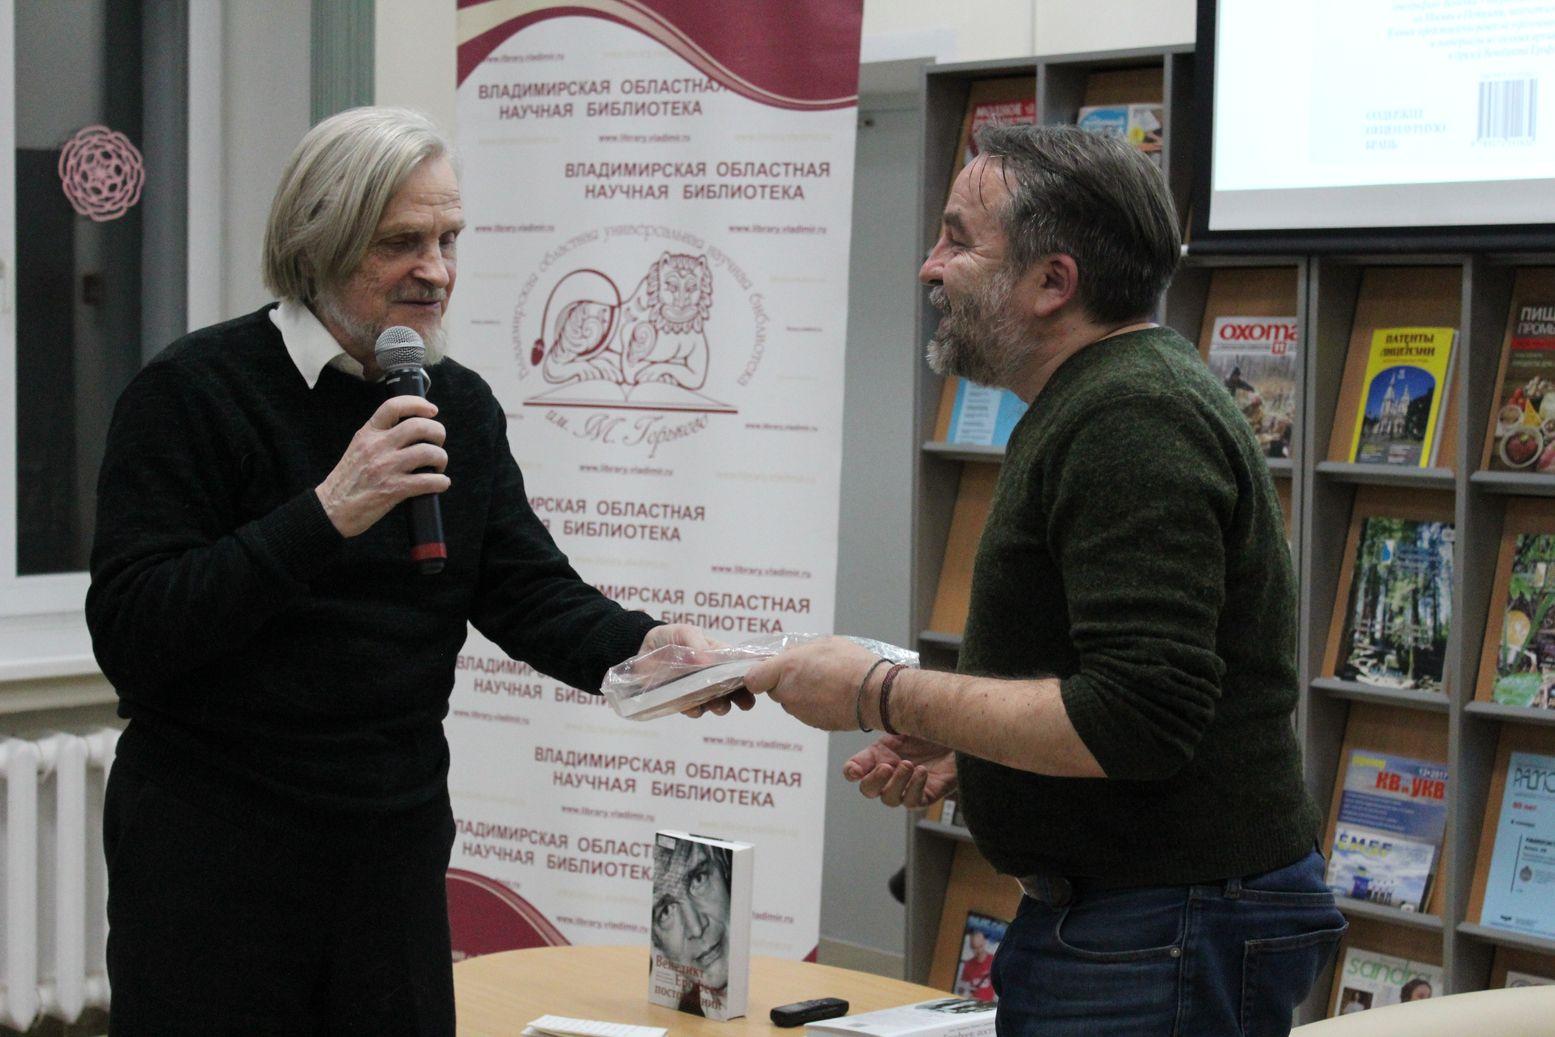 Вячеслав Улитин и Олег Лекманов